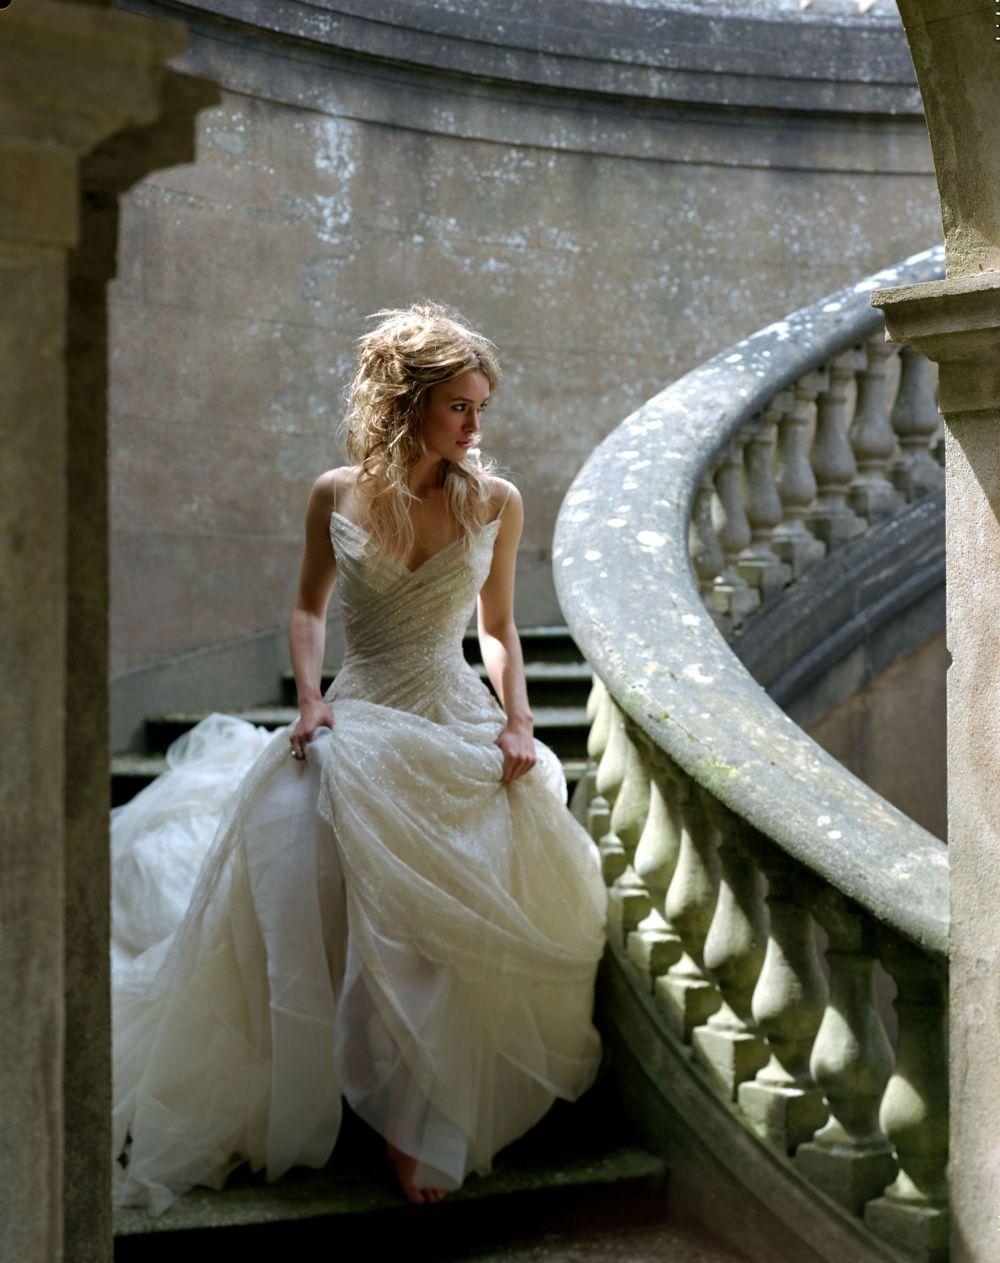 Wedding dresses for thin figures Кира Найтли   Сelebrities Woman    Pinterest  Wedding